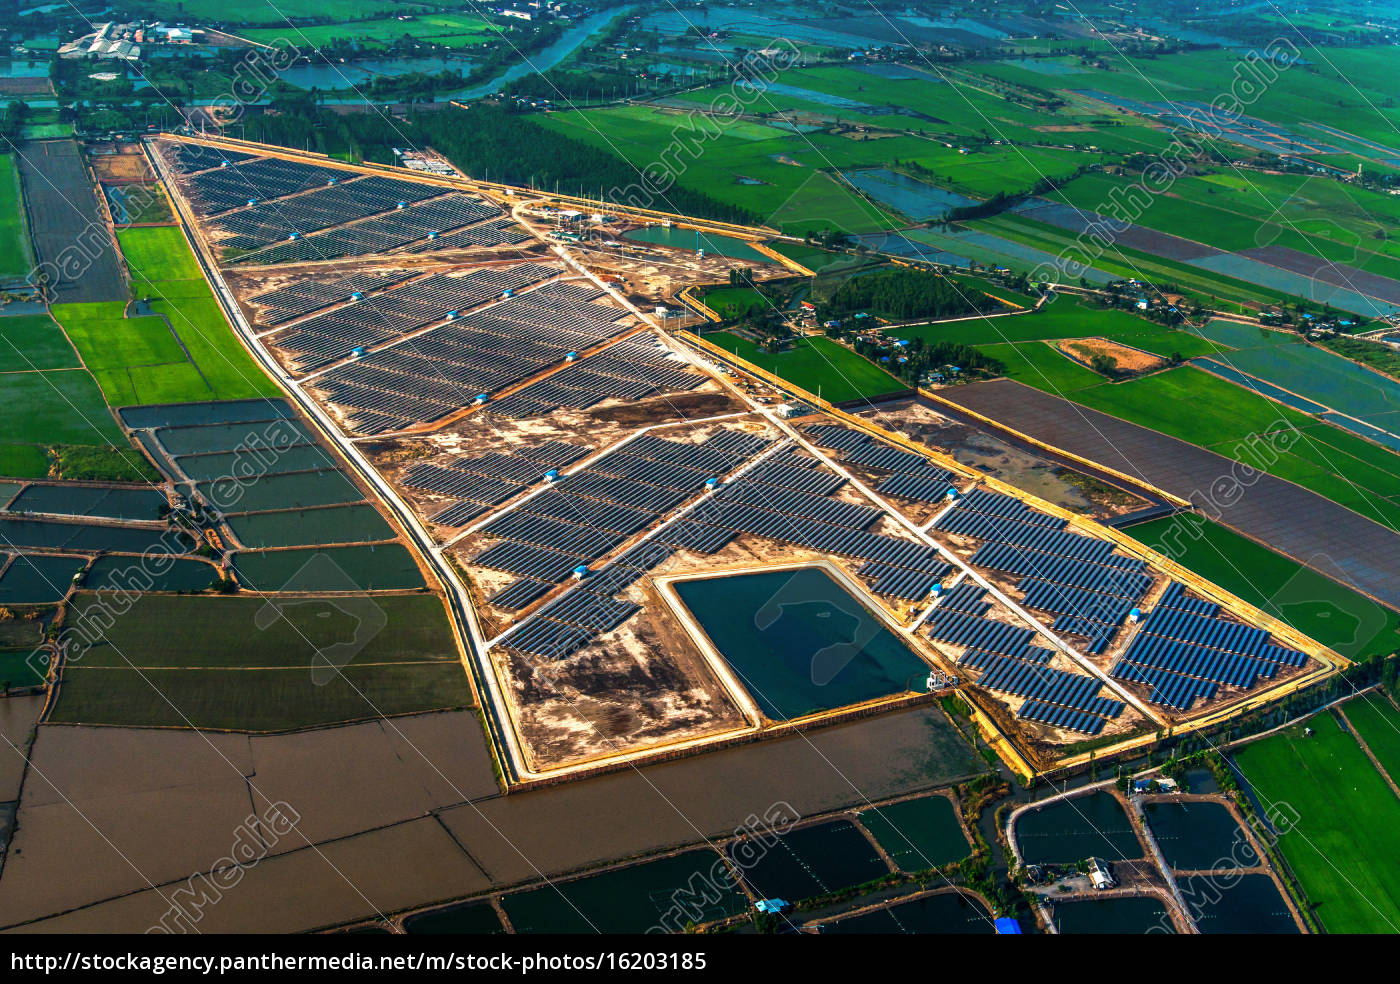 granja, solar, paneles, solares, foto, del, aire - 16203185